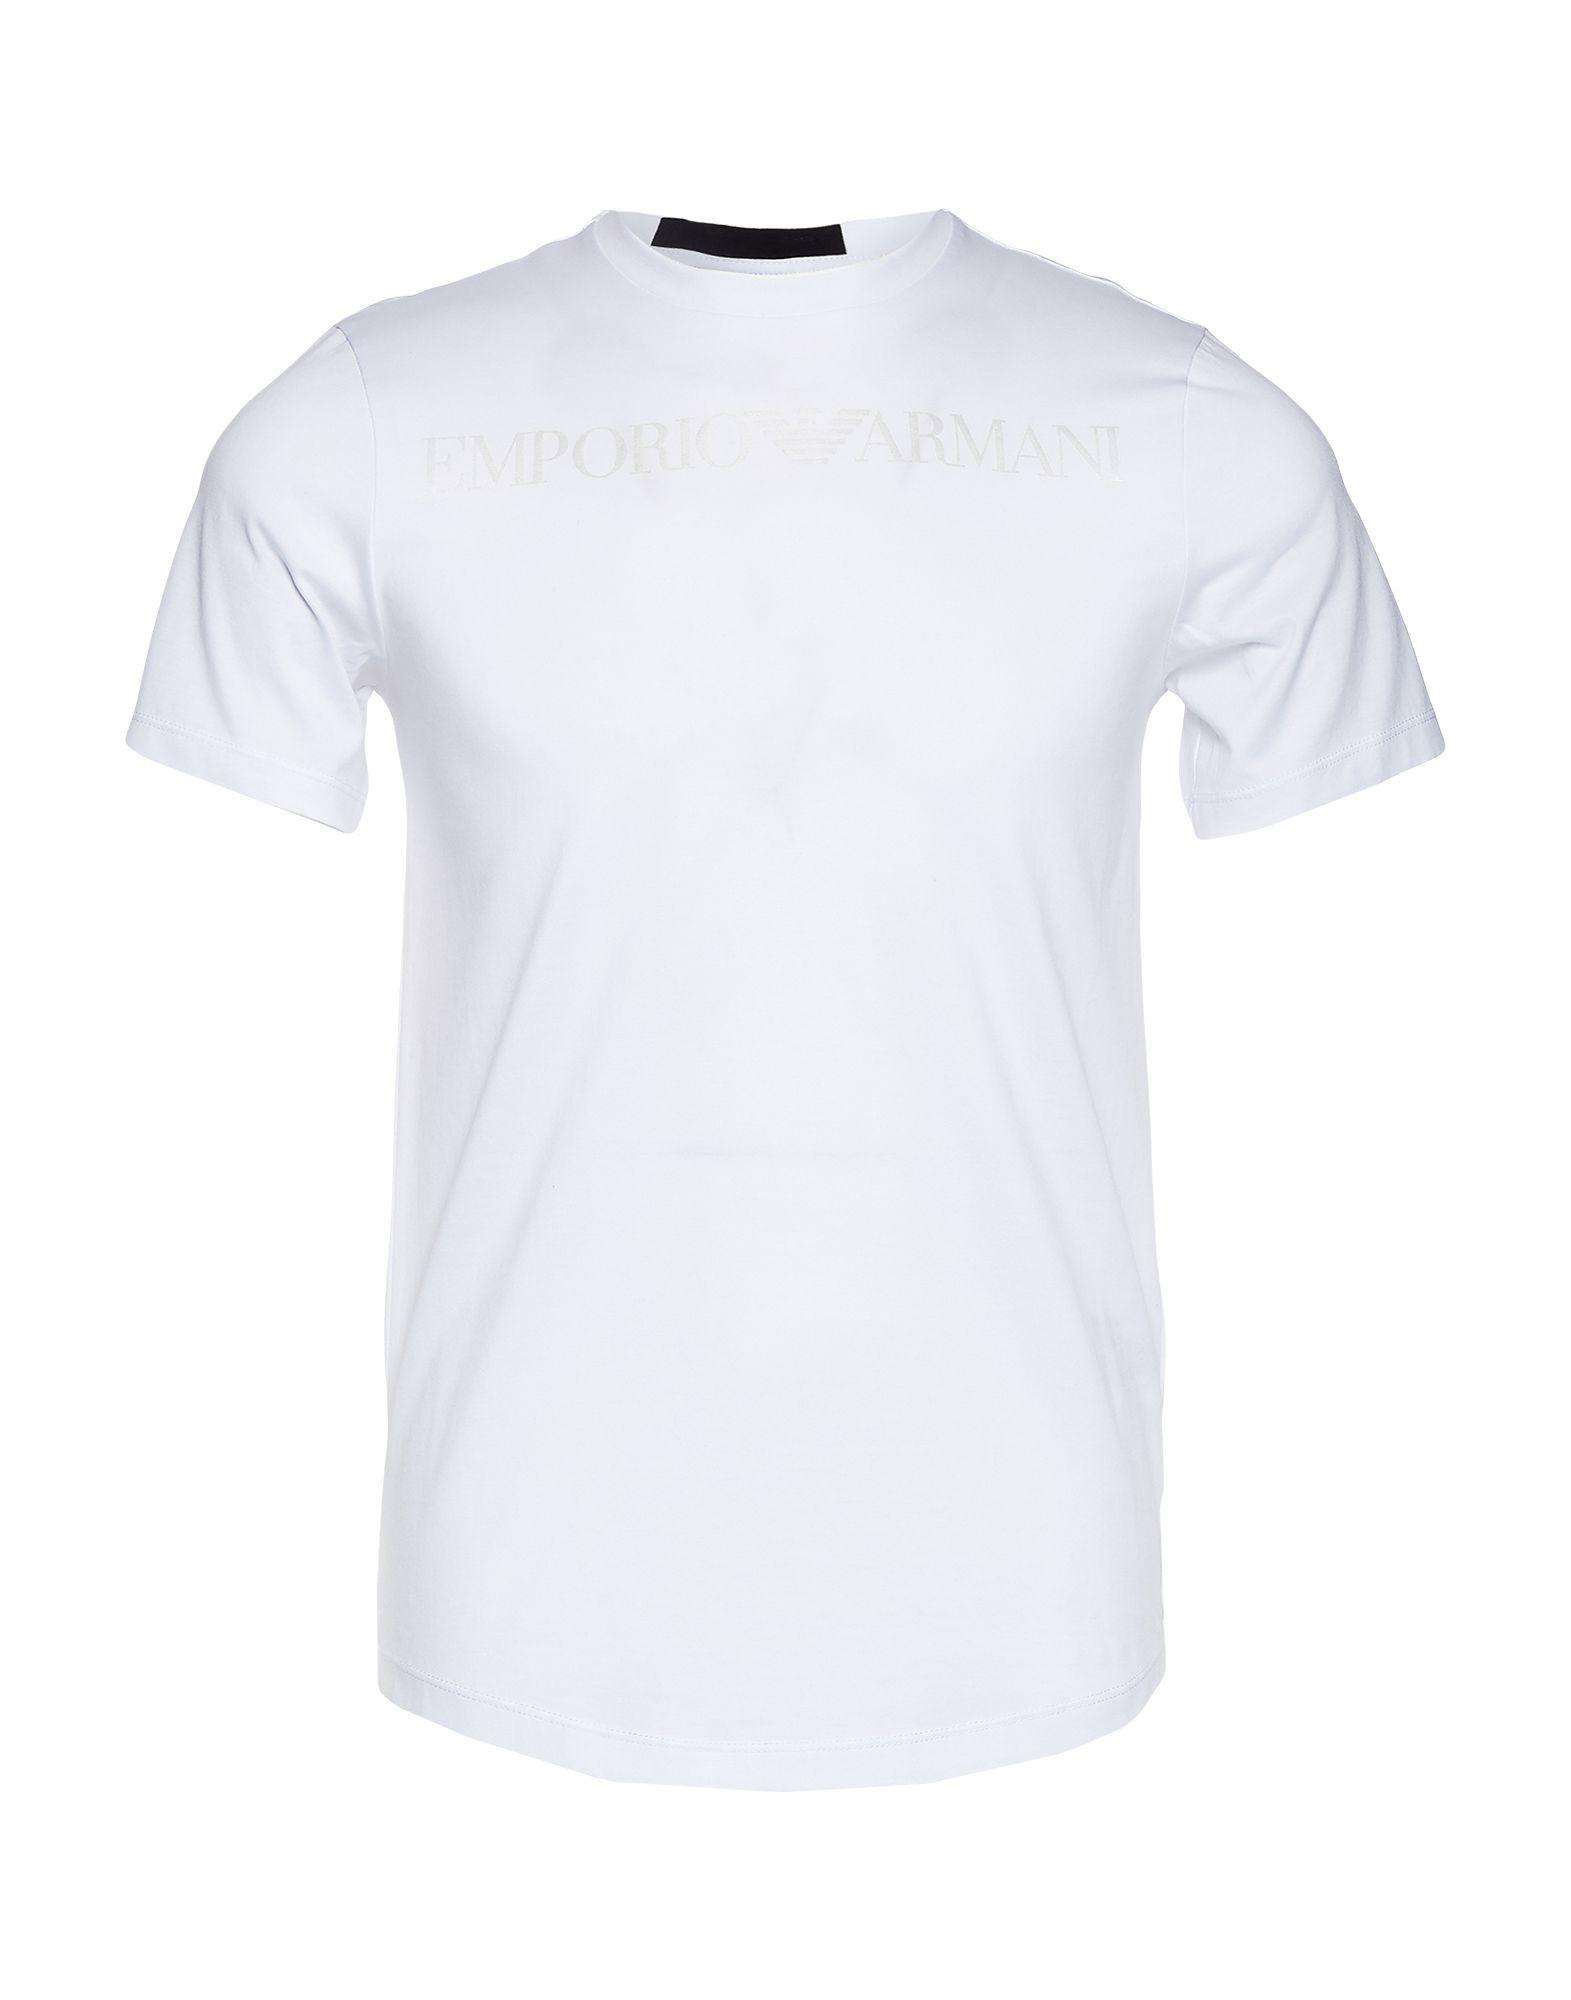 EMPORIO ARMANI Футболка футболка emporio armani emporio armani em598ewblnq5